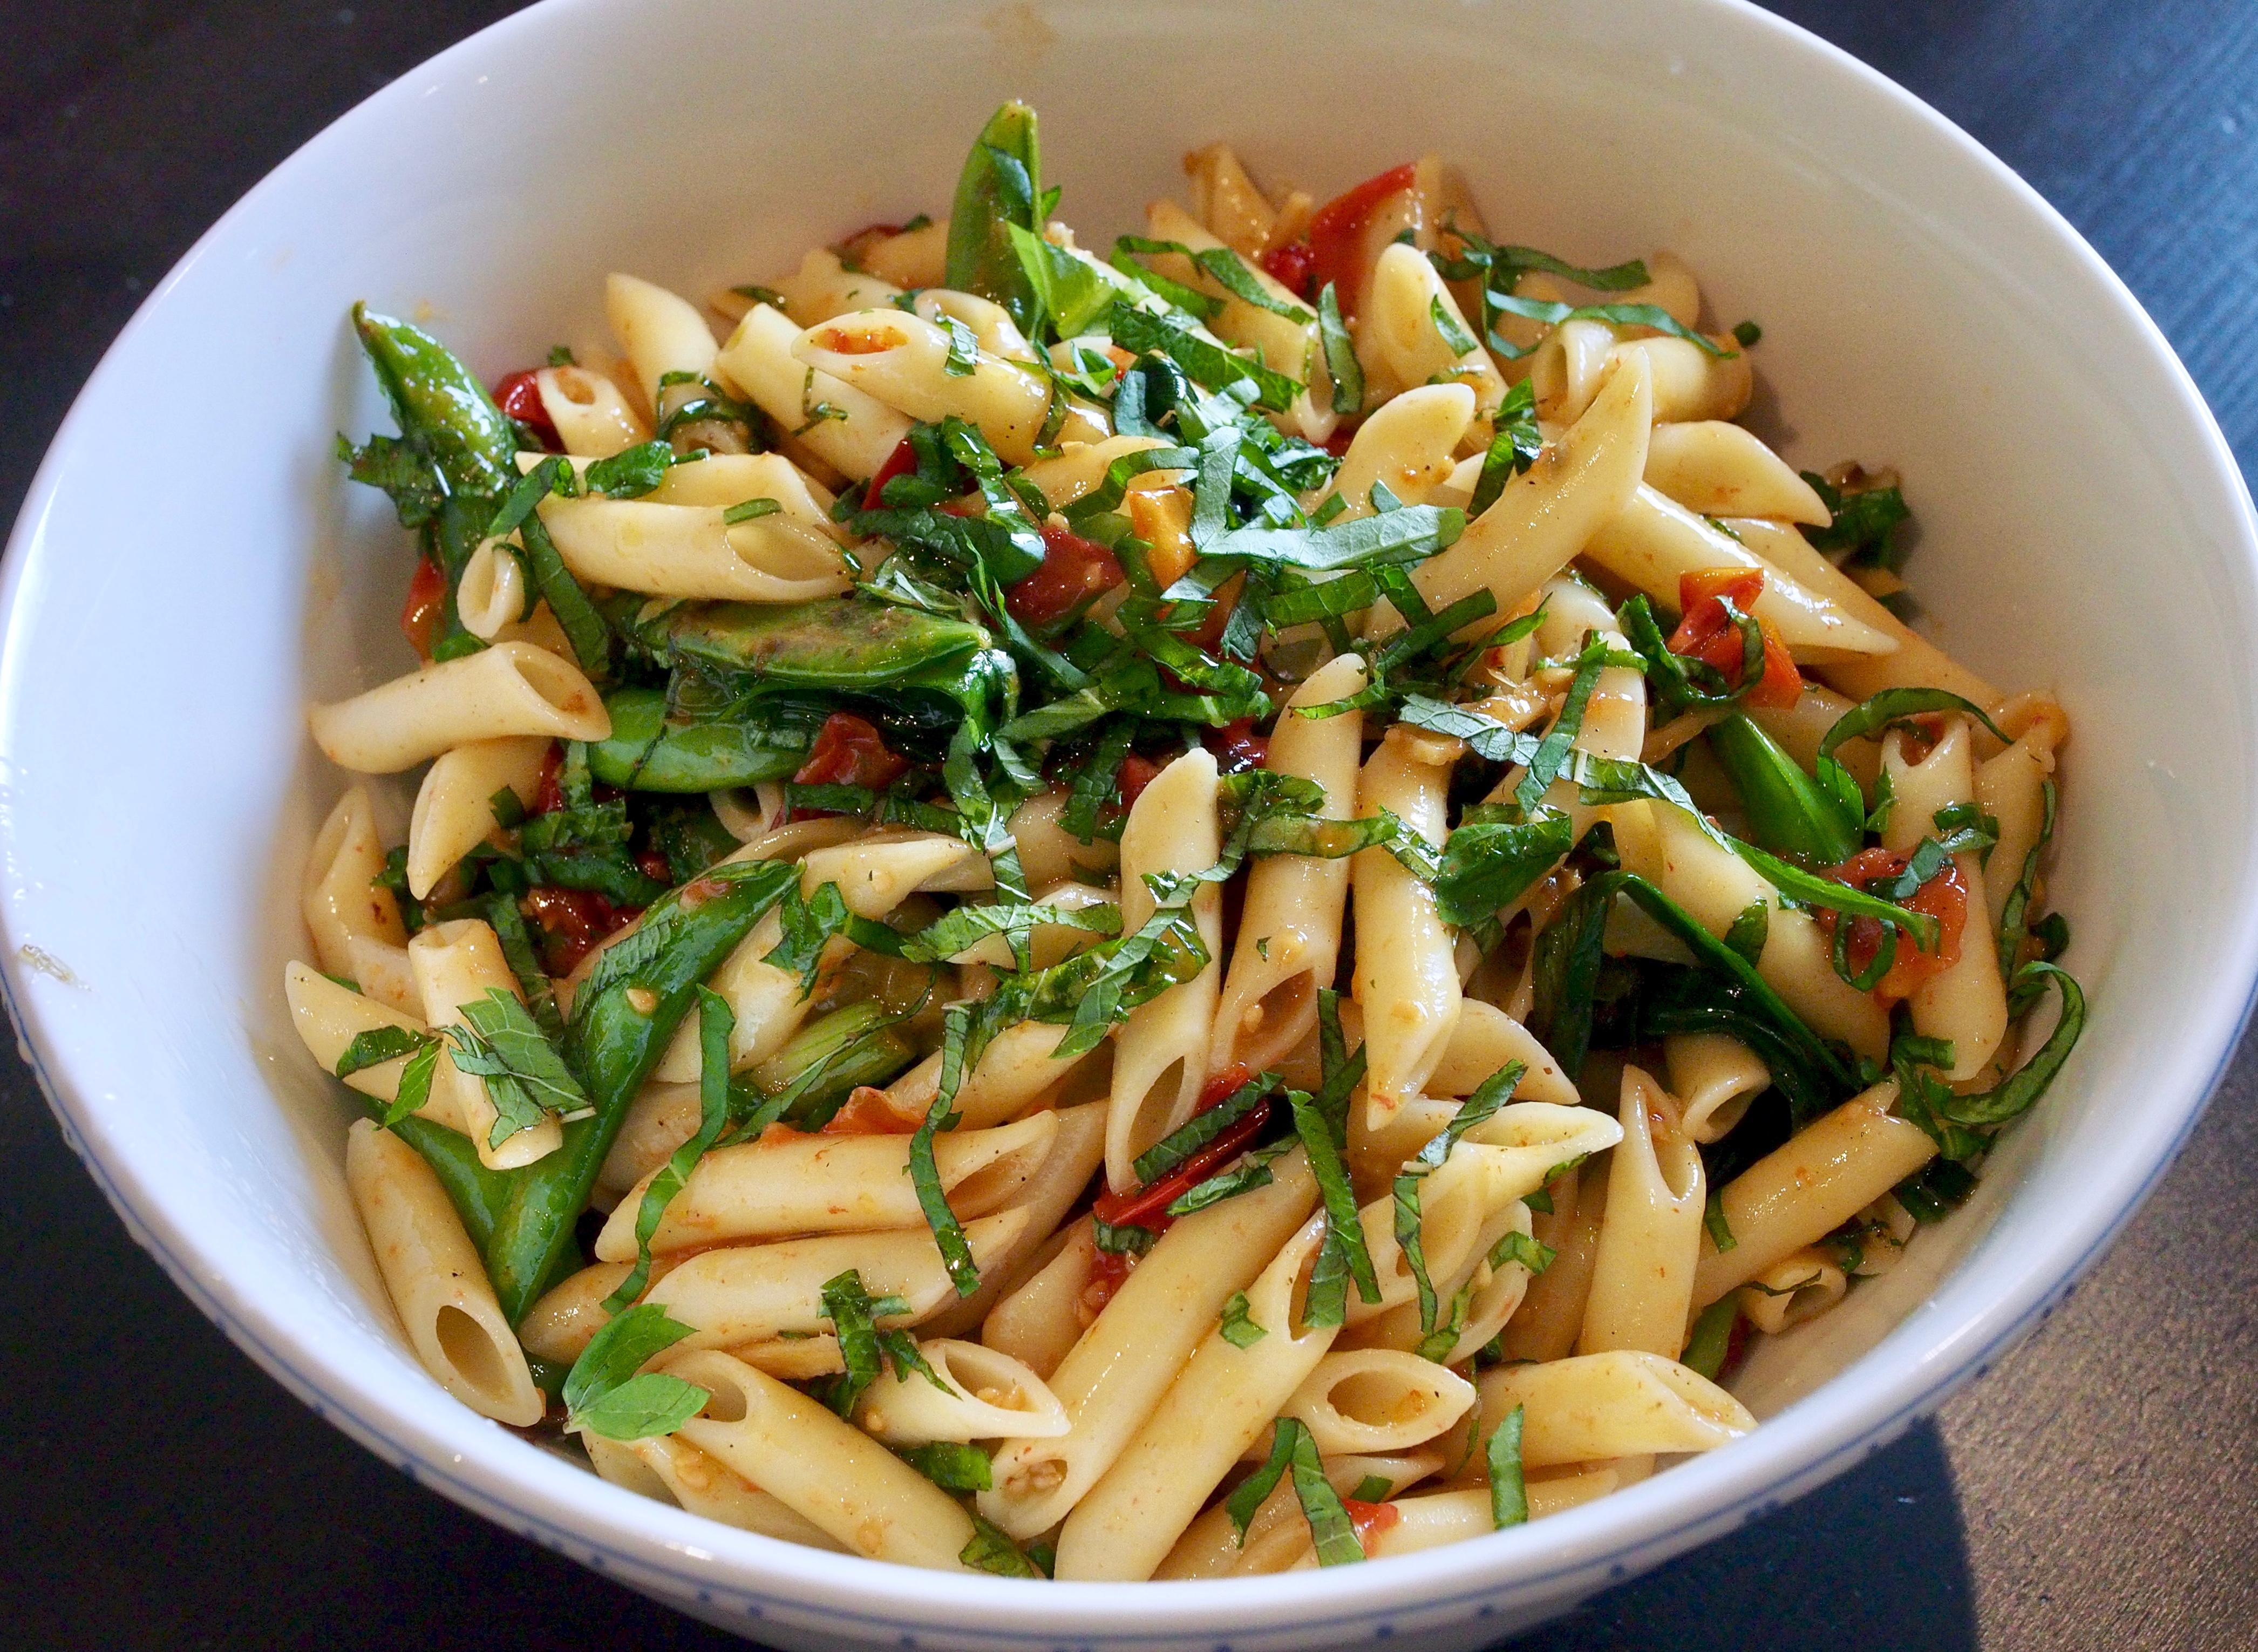 Tomato and sugar snap pea pasta salad